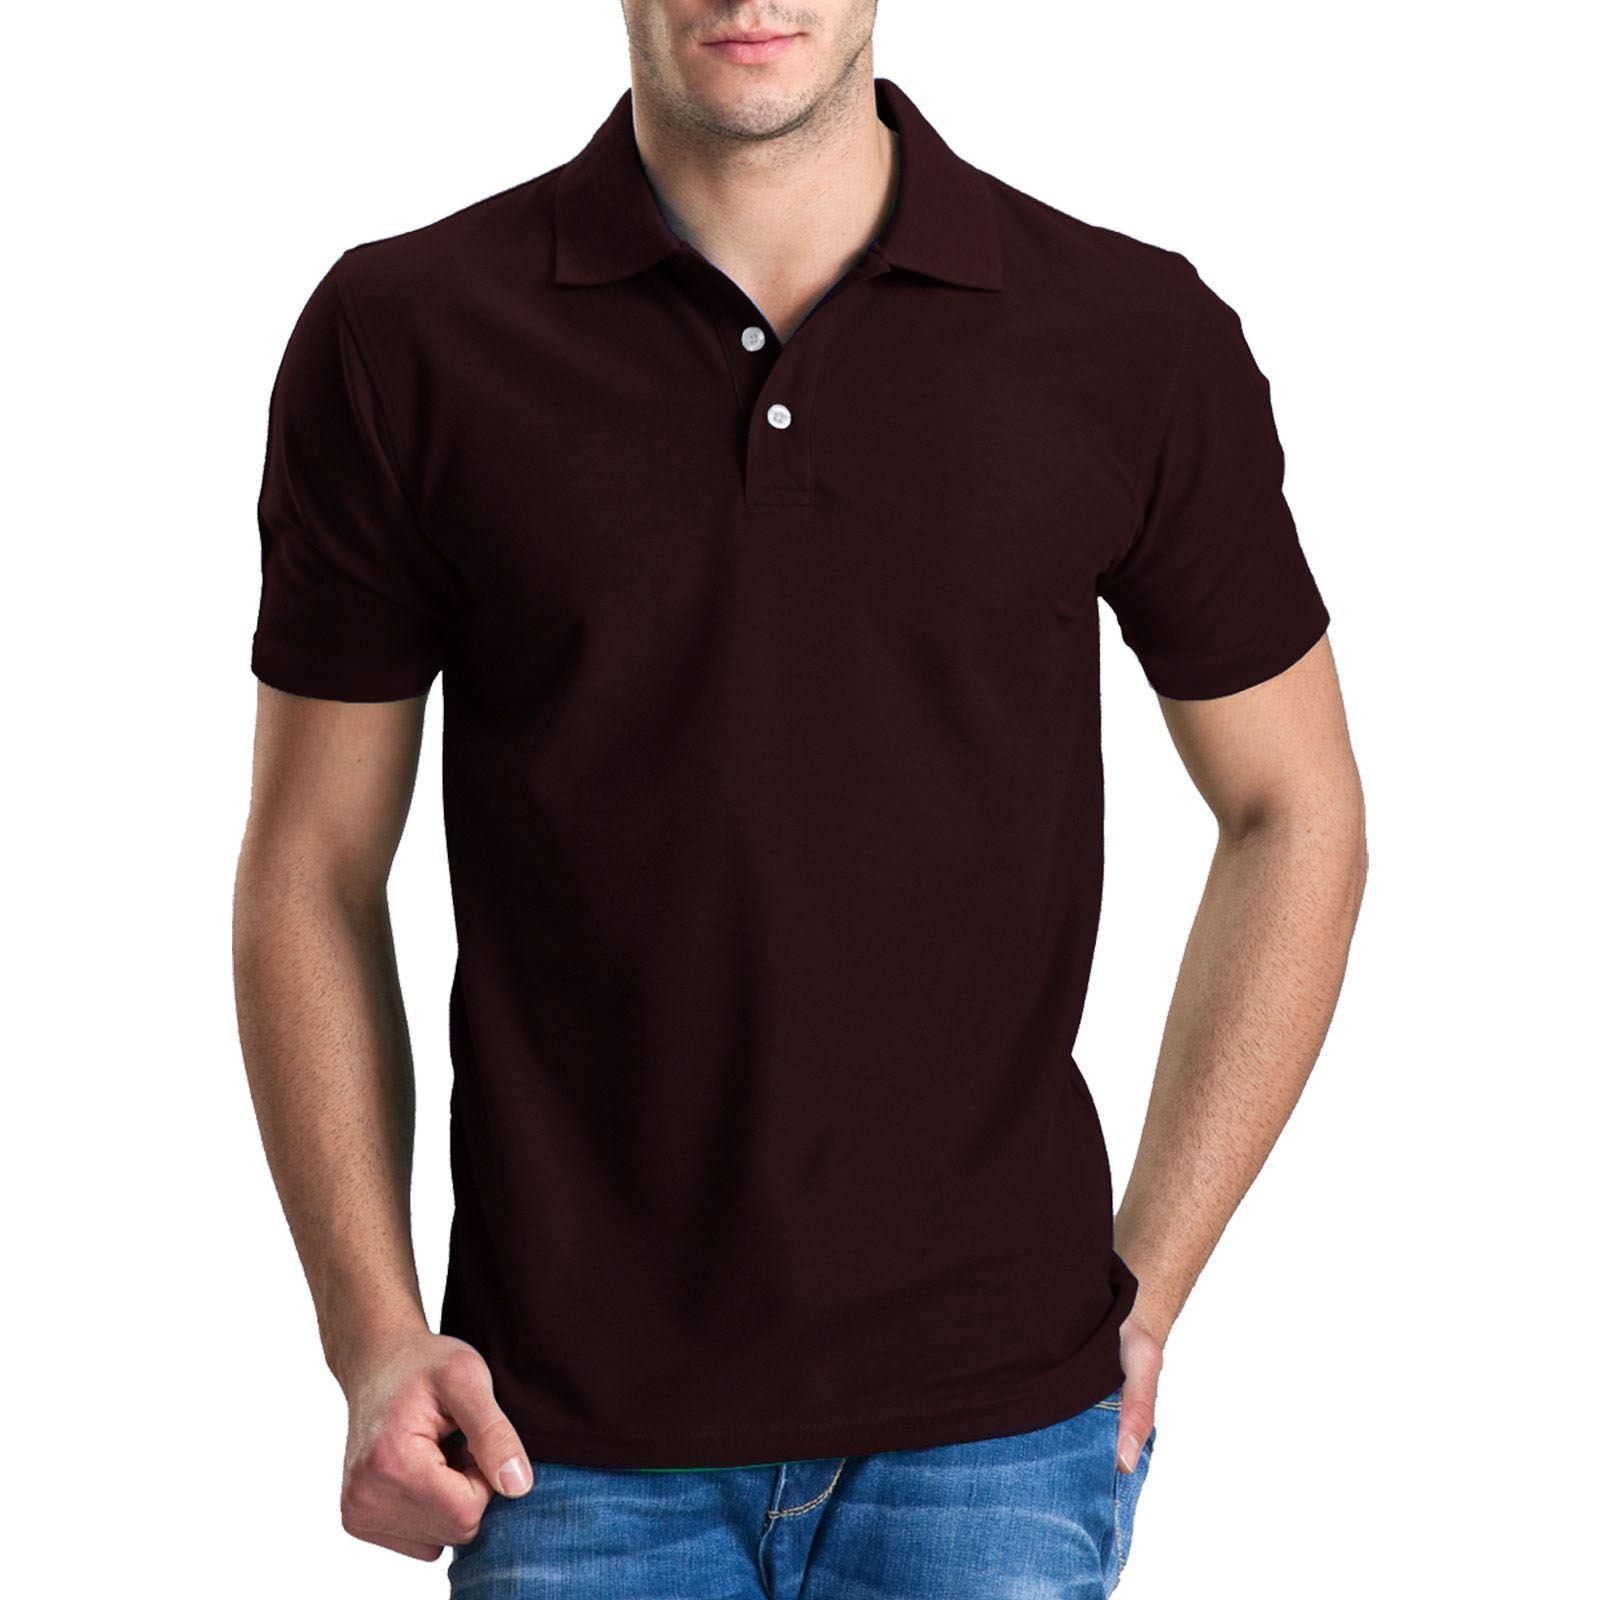 New Mens Polo T Shirts Short Sleeves Top Golf Tennis Tees